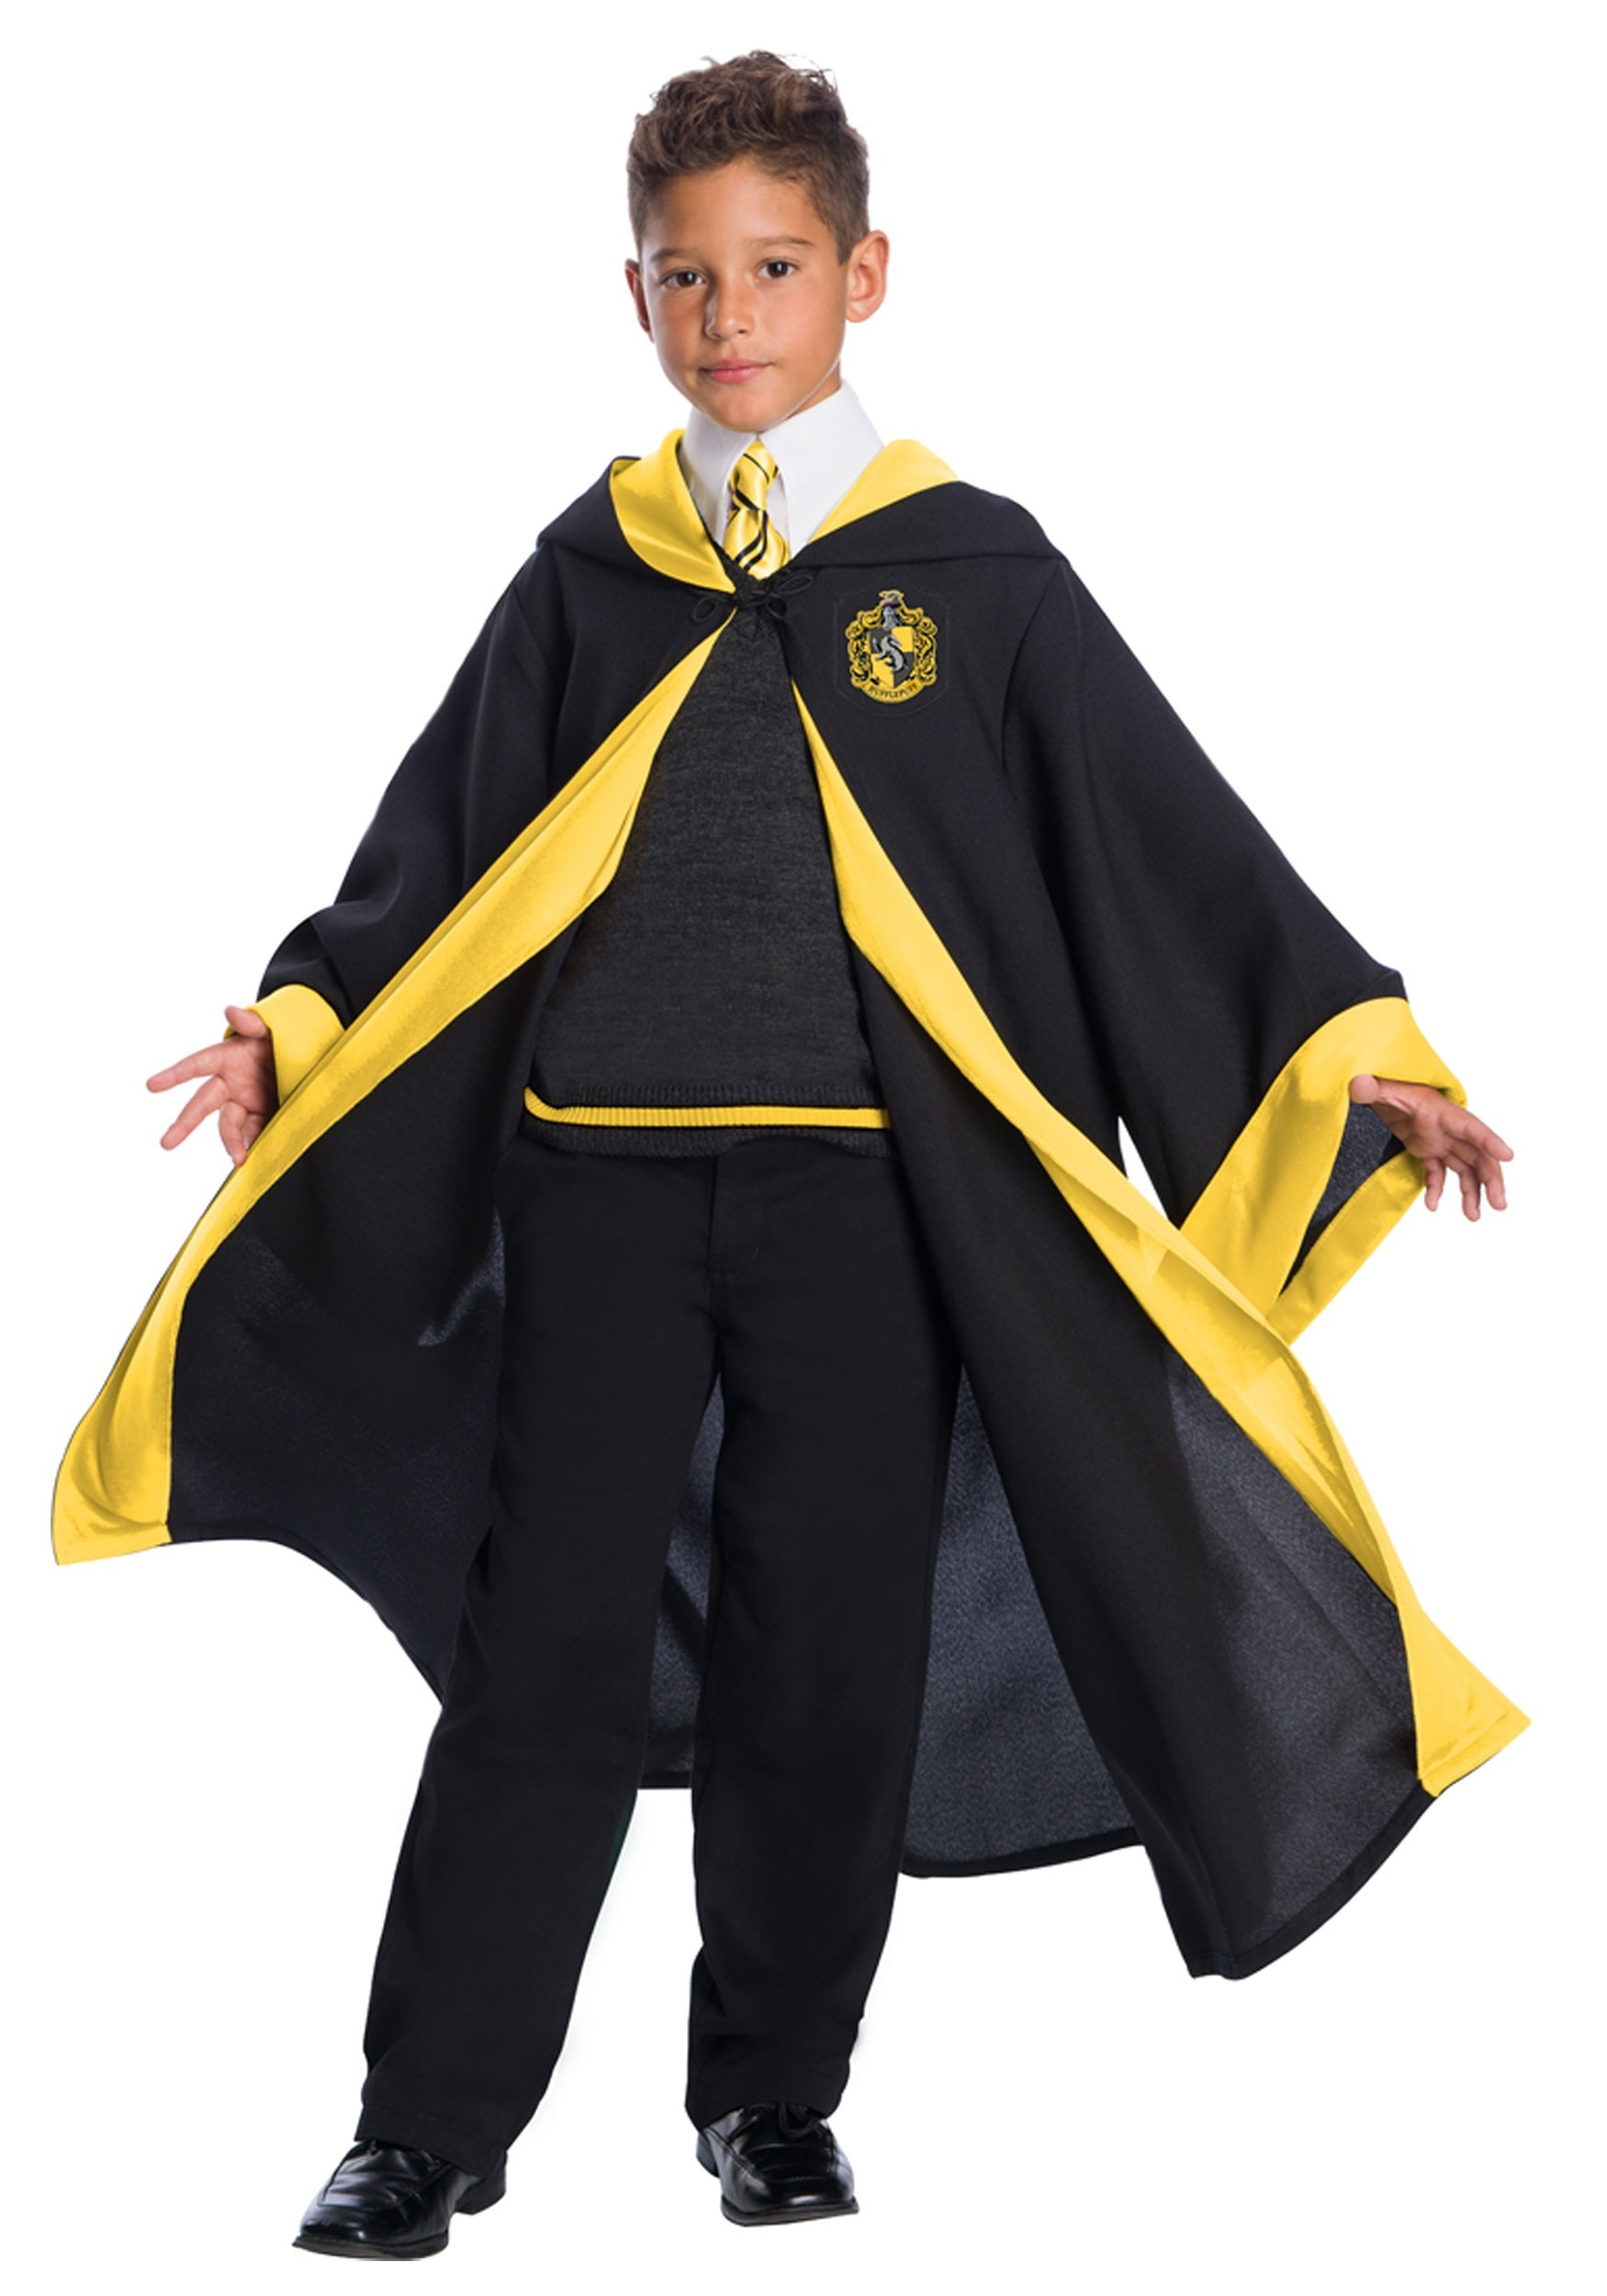 Deluxe Child Hufflepuff Student Costume